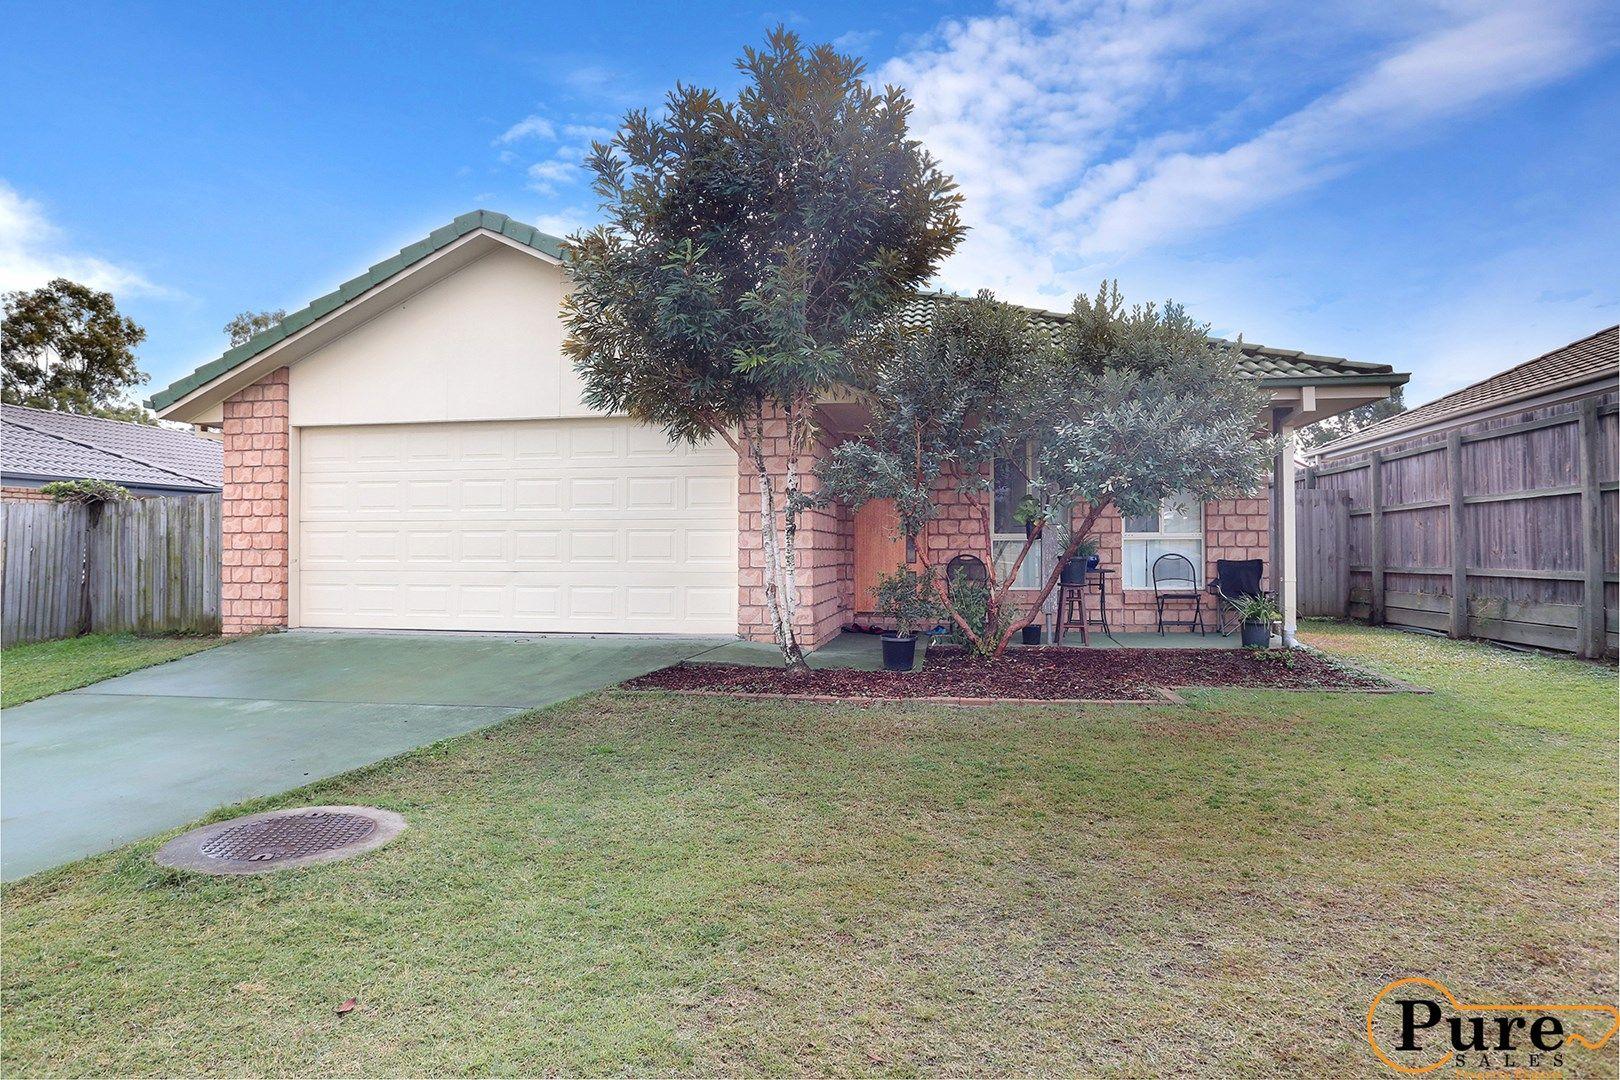 35 Jonic Drive, Goodna QLD 4300, Image 0